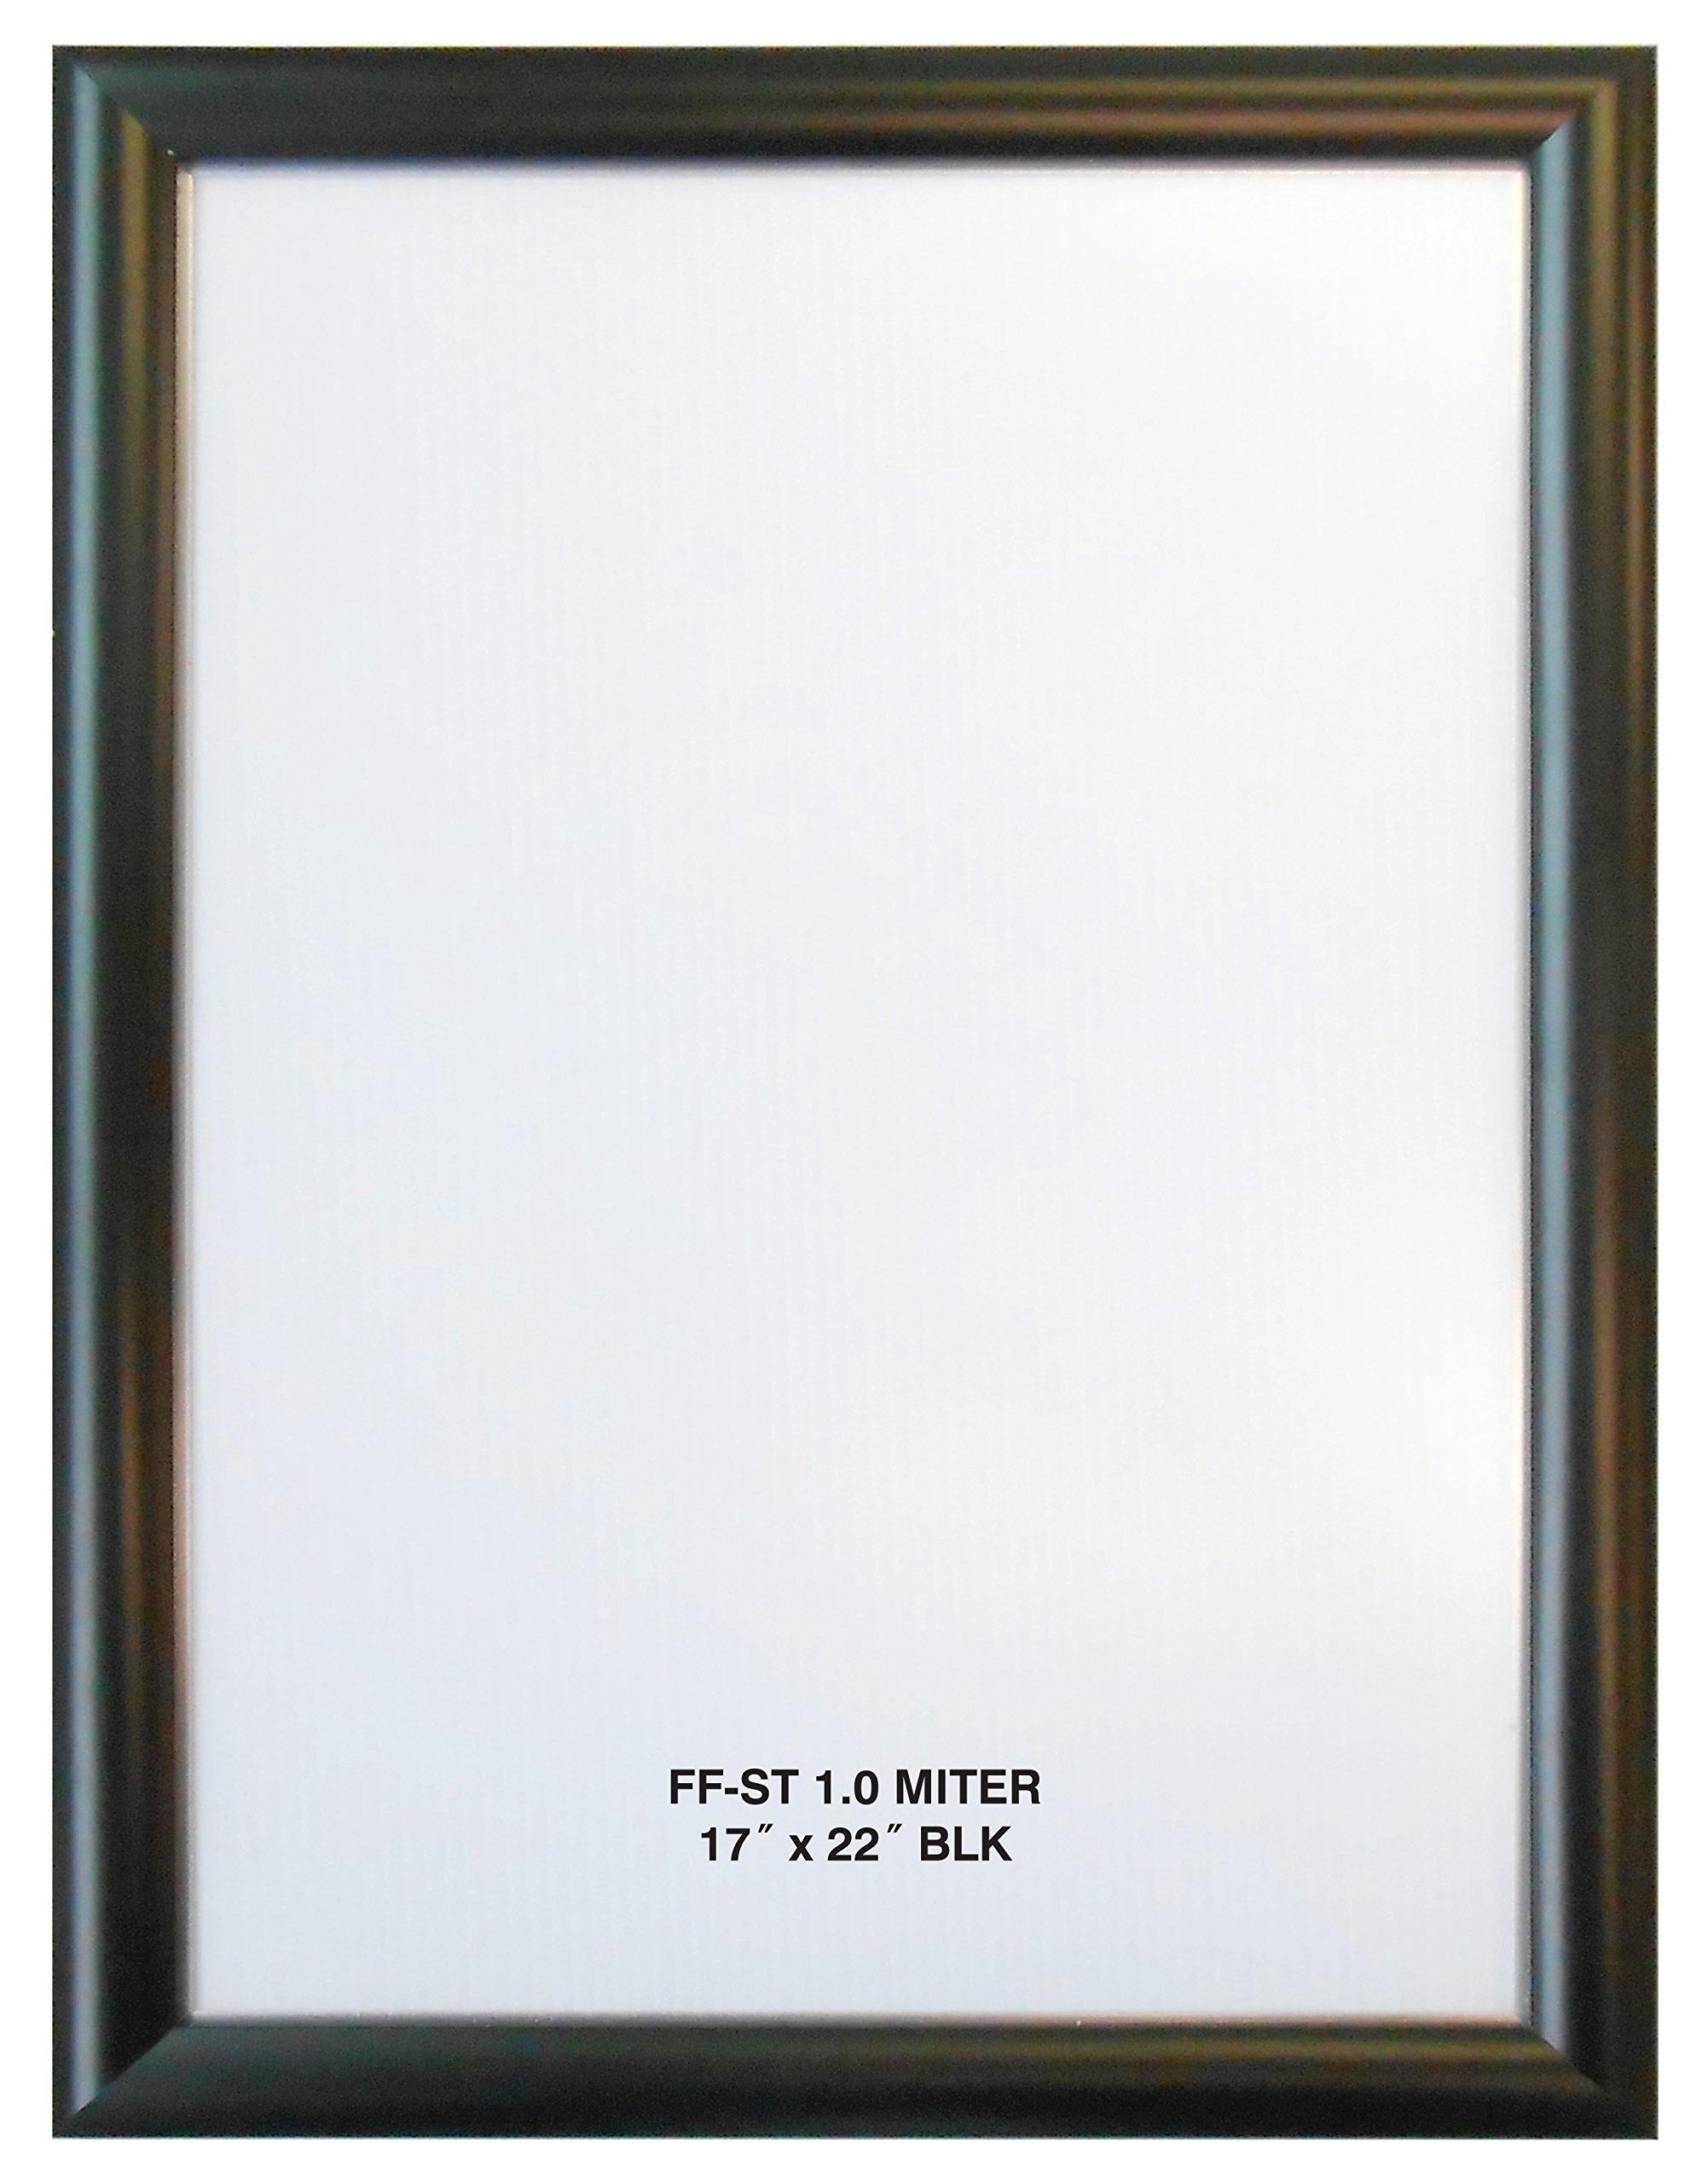 Alpina Manufacturing 17x22 Black Aluminum Snap Frame 1.0'' Profile, Wall Mounted